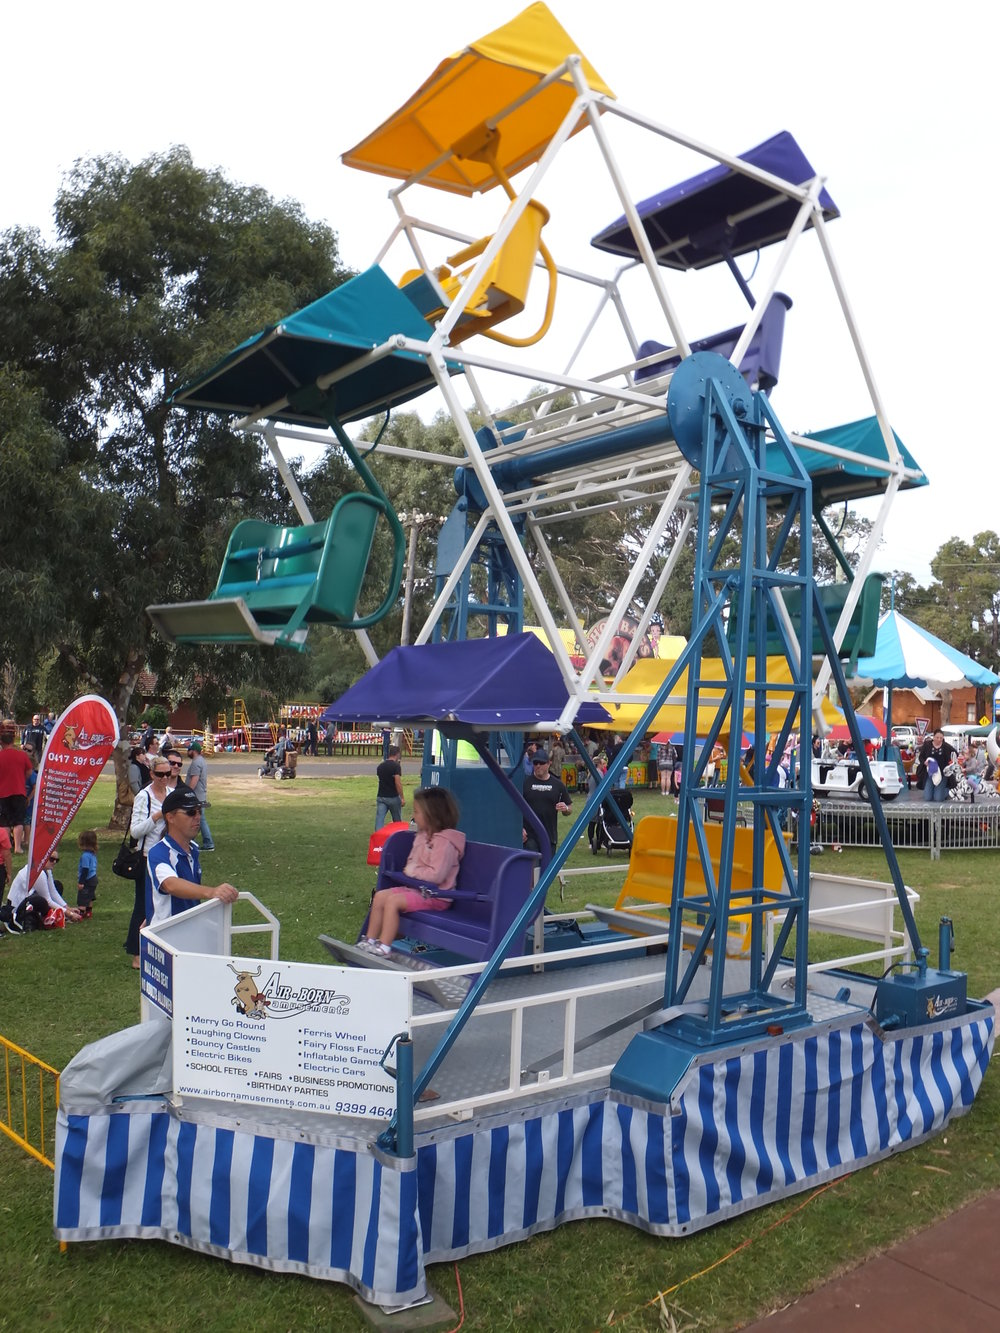 Ferris-Wheel-Hire222222222.jpg